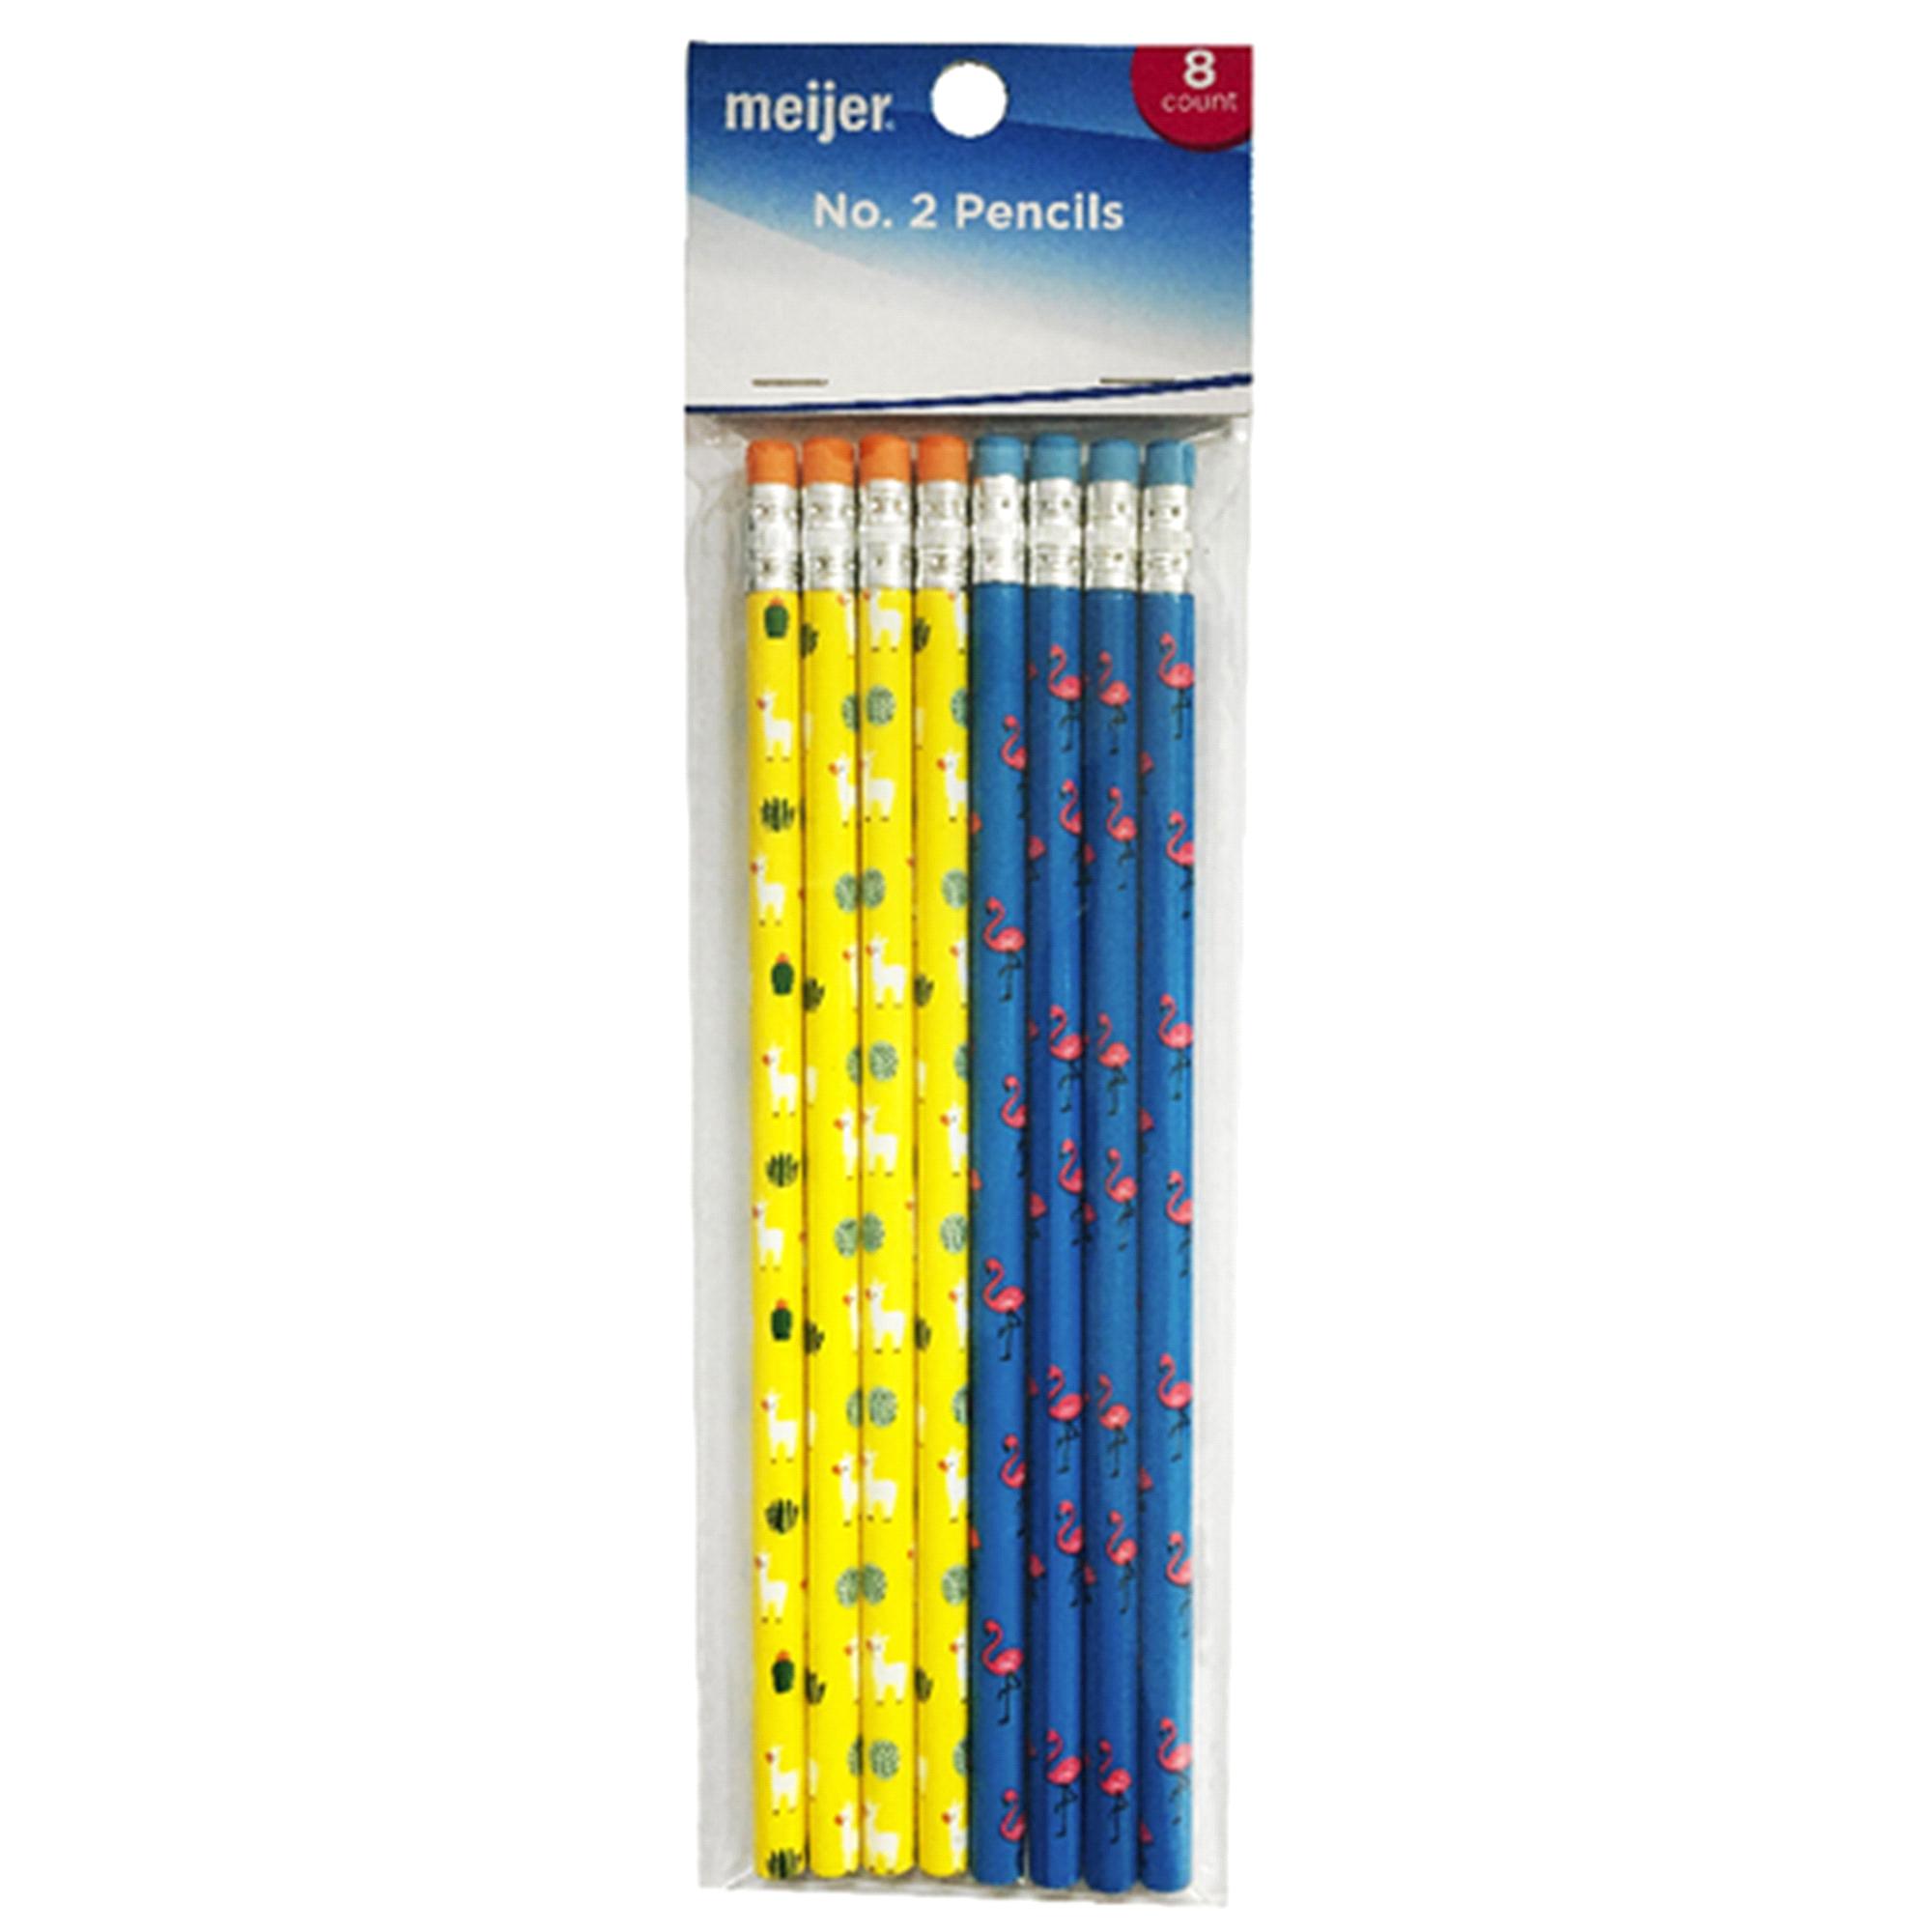 Incroyable Meijer Llama Pencils 8ct   Meijer.com